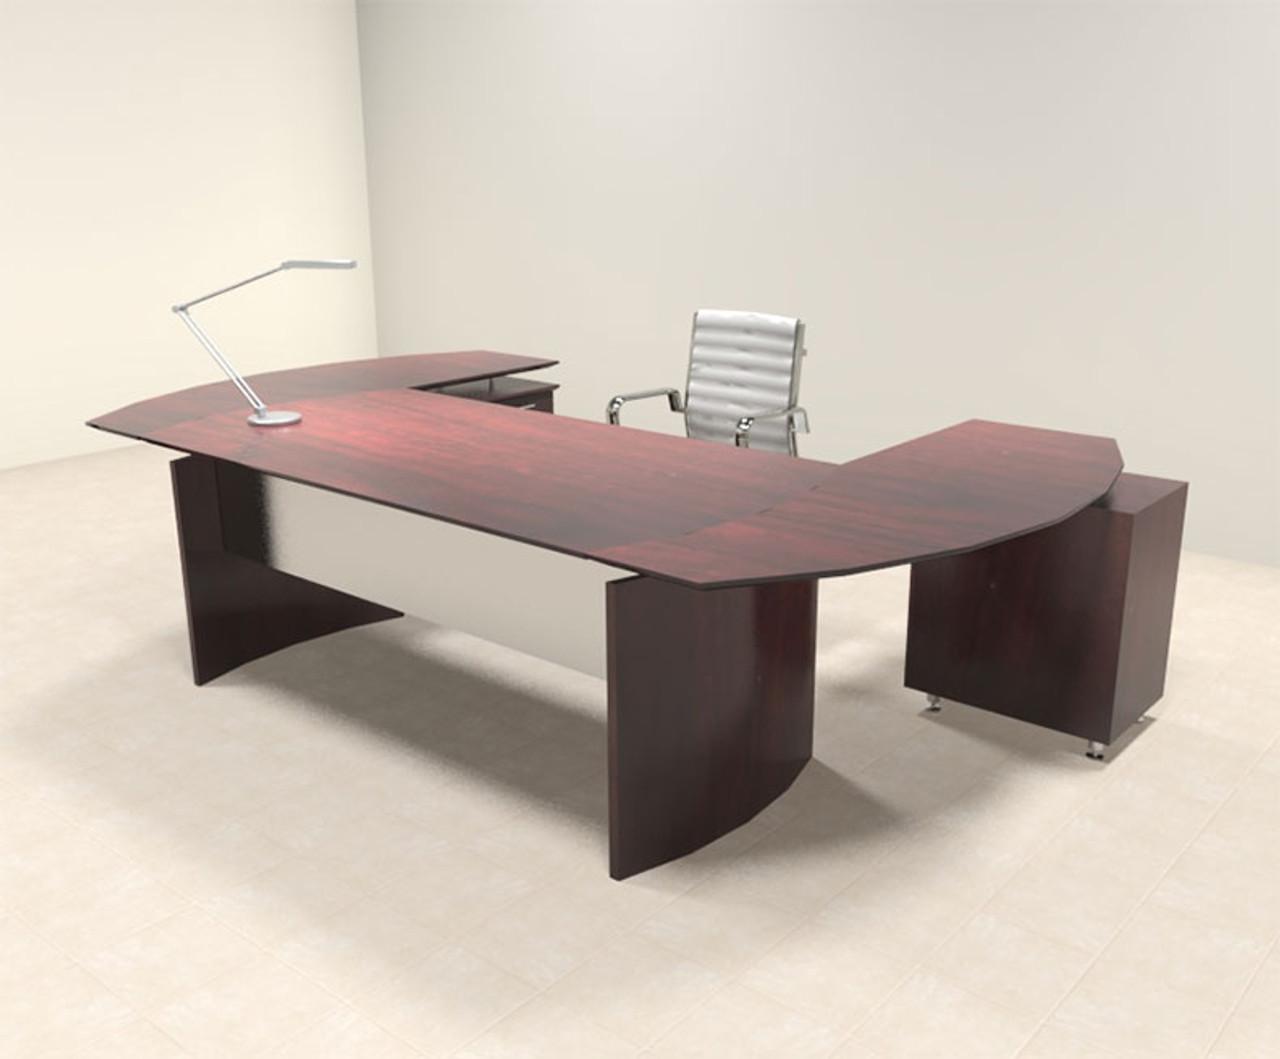 3pc Modern Contemporary U Shaped Executive Office Desk Set, #MT-MED-O8